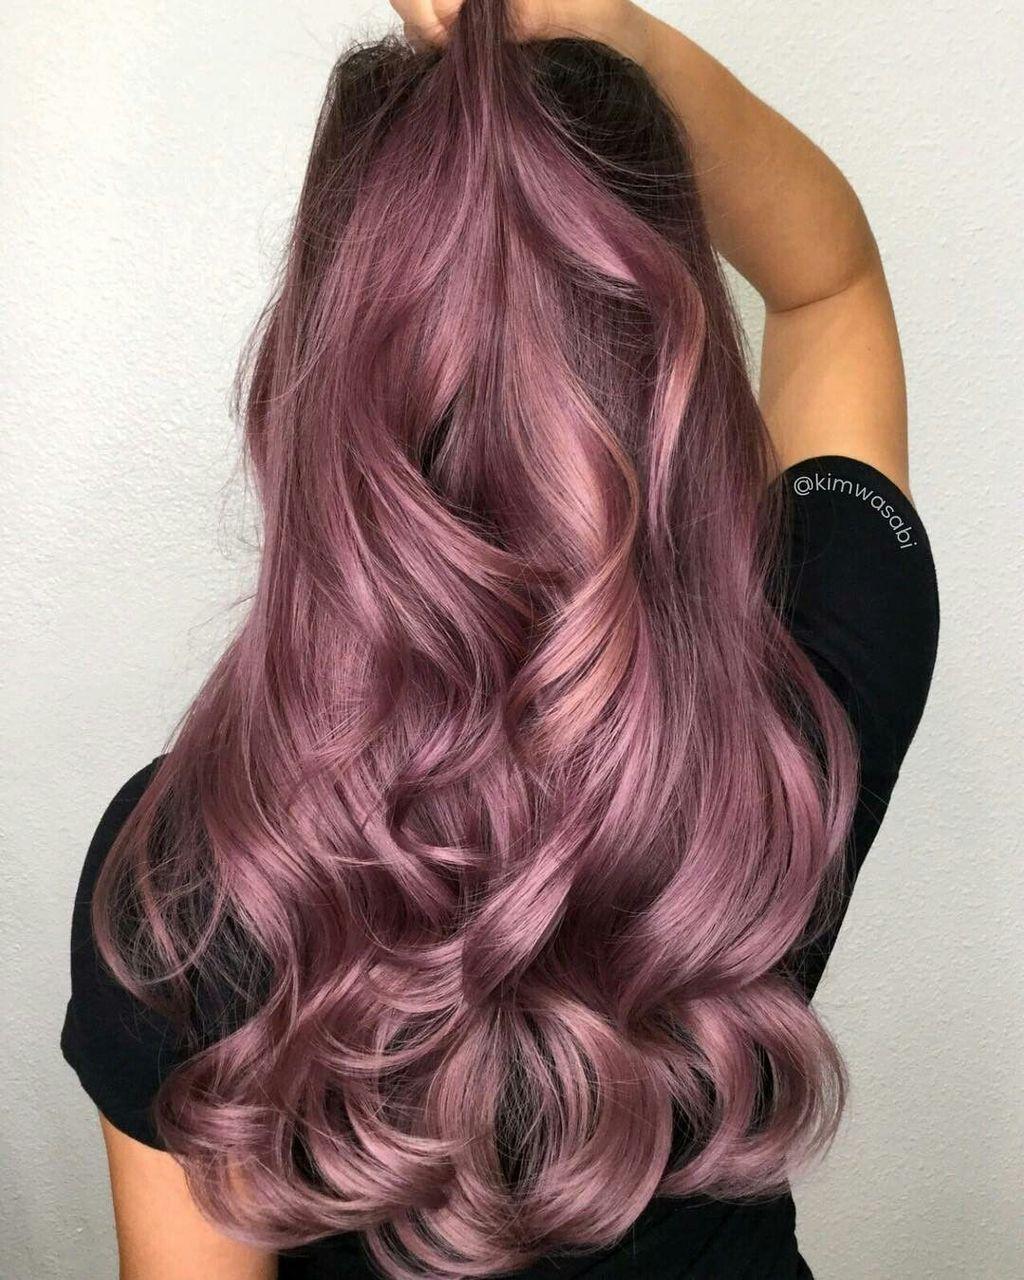 50 Elegant Spring Hair Color Ideas For 2019 Rose Hair Color Spring Hair Color Cool Hair Color